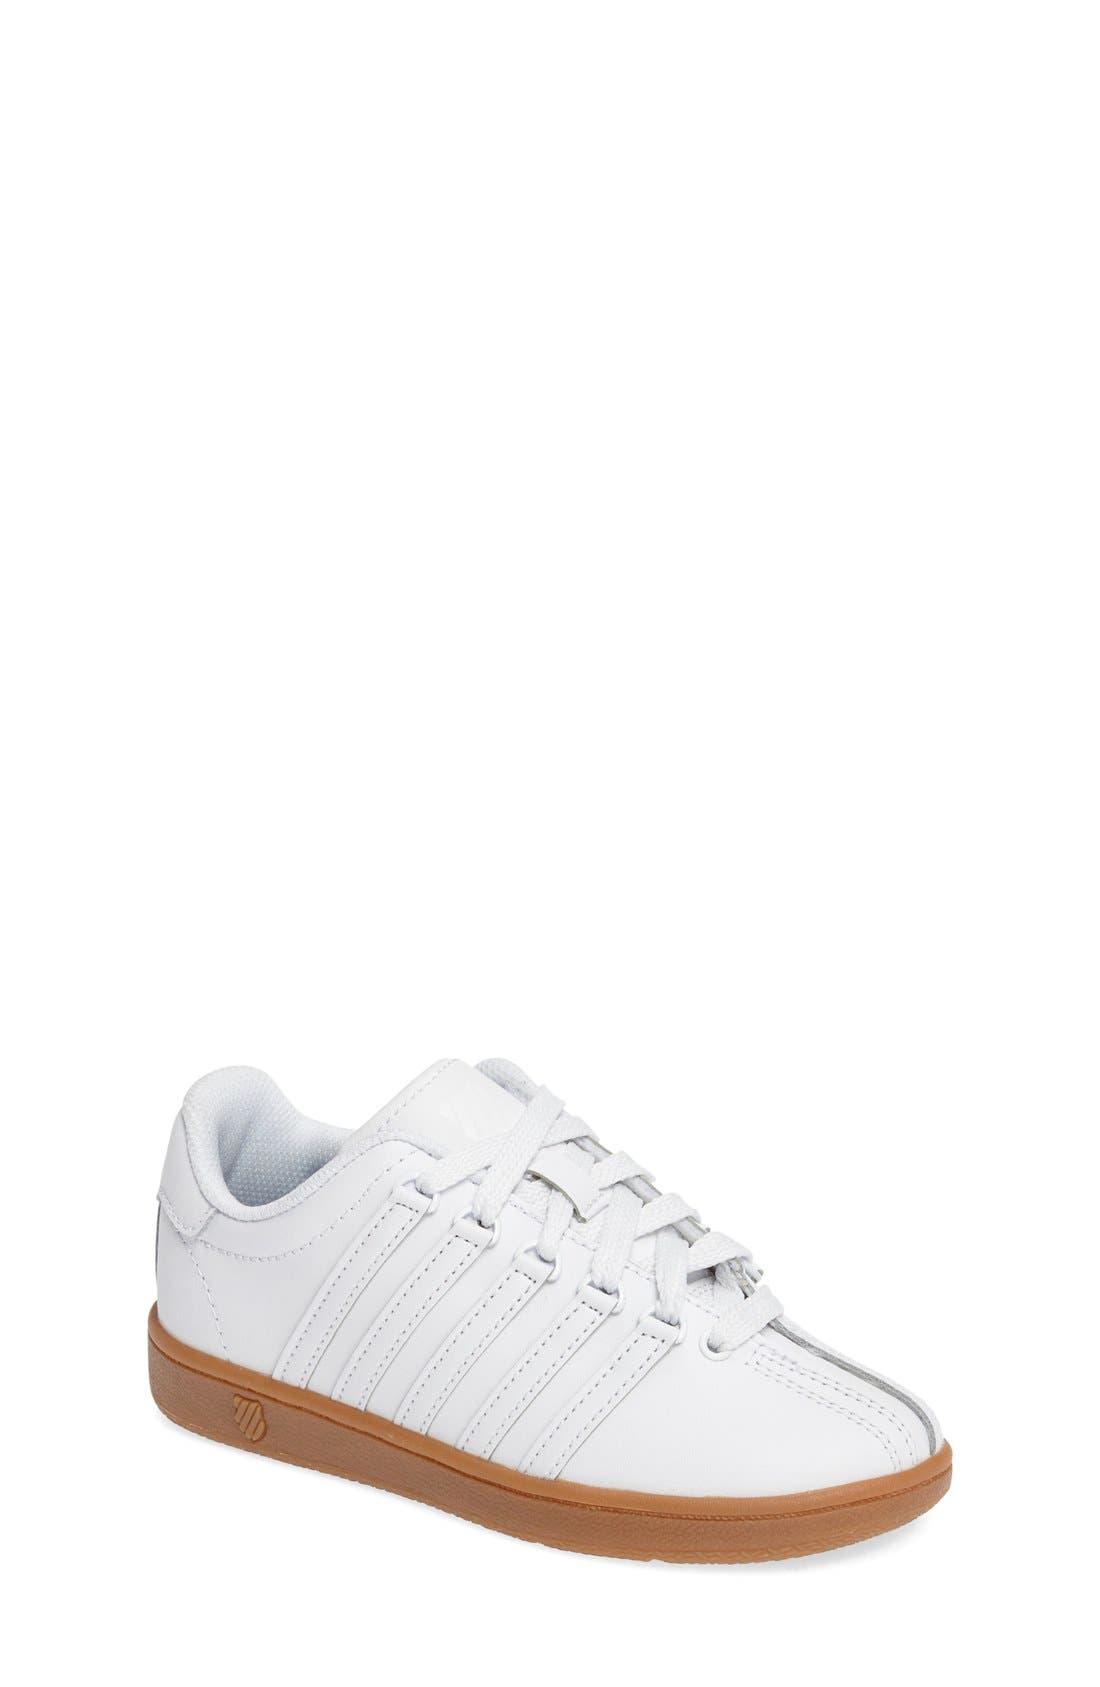 'Classic' Sneaker,                             Main thumbnail 6, color,